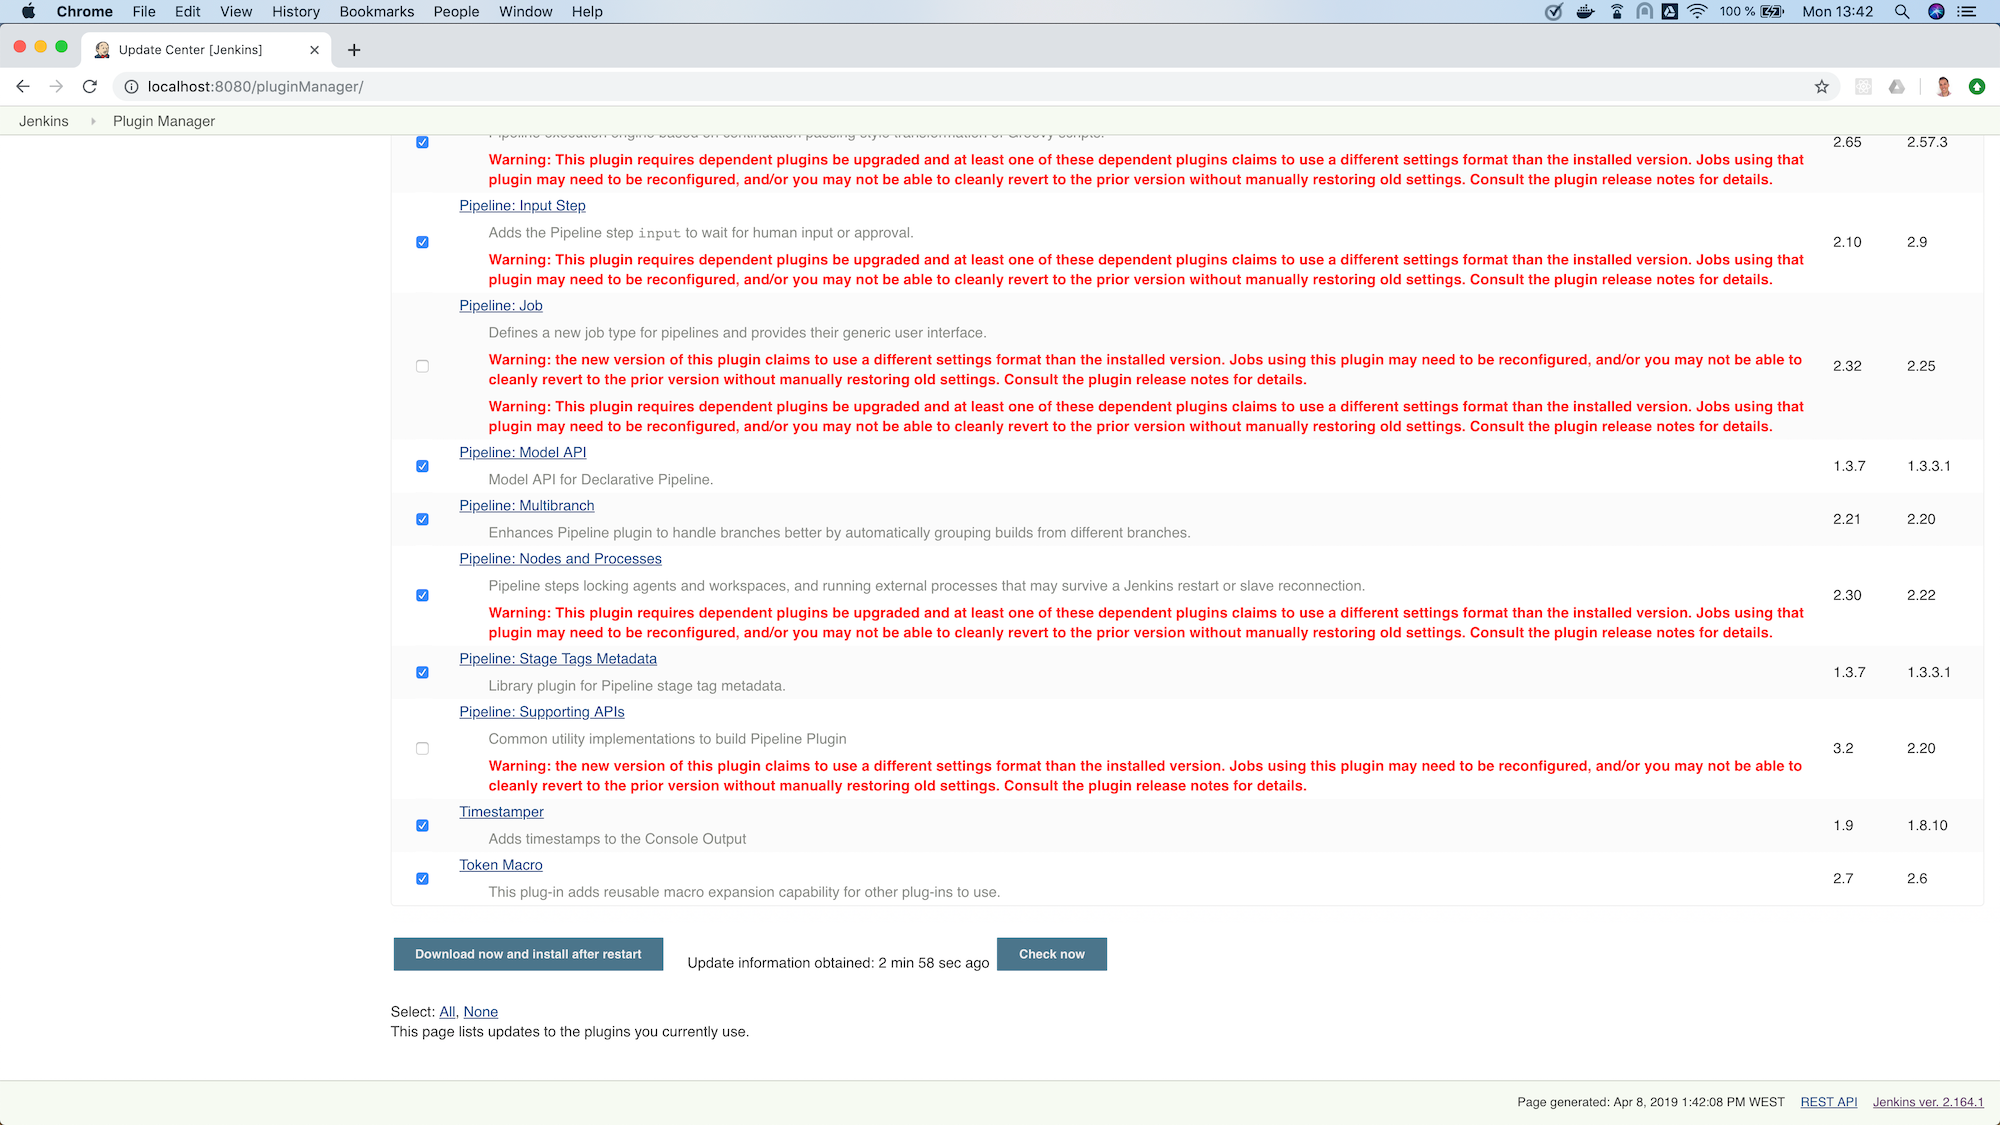 jenkins plugin manager updates selected bottom